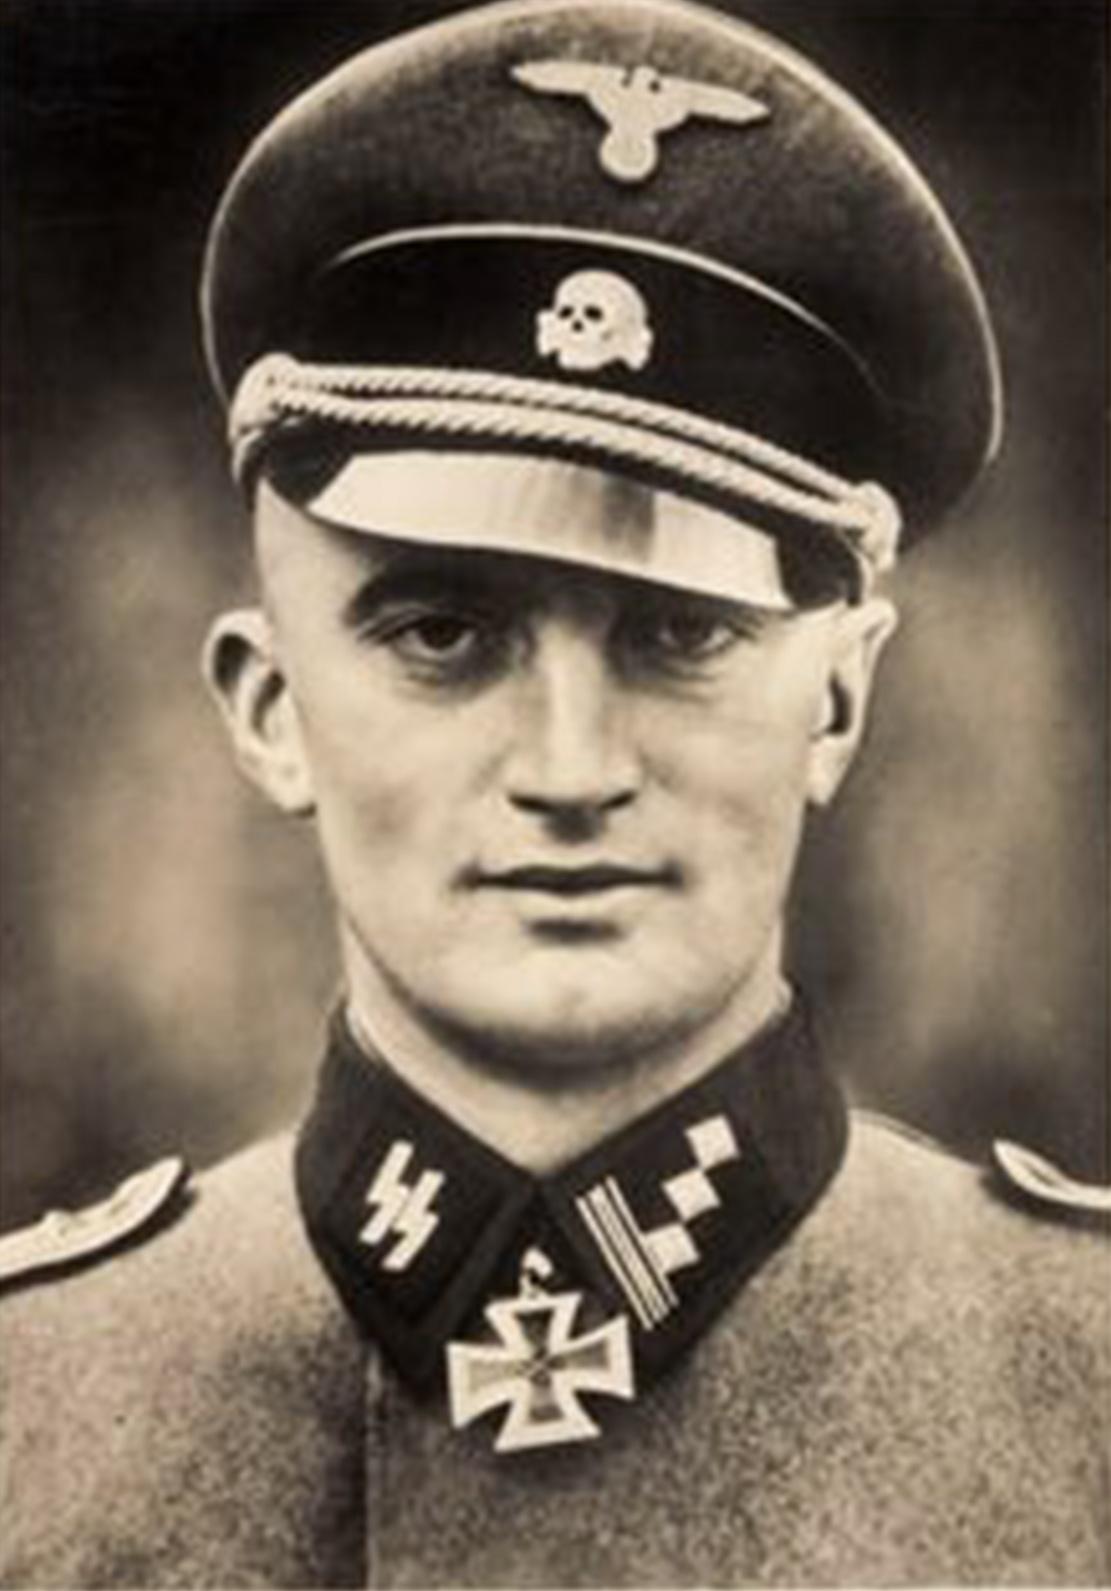 Ludwig Kepplinger men beautiful nazi blog blogger moda luciano lapadula macabro grottesco nazismo estetica